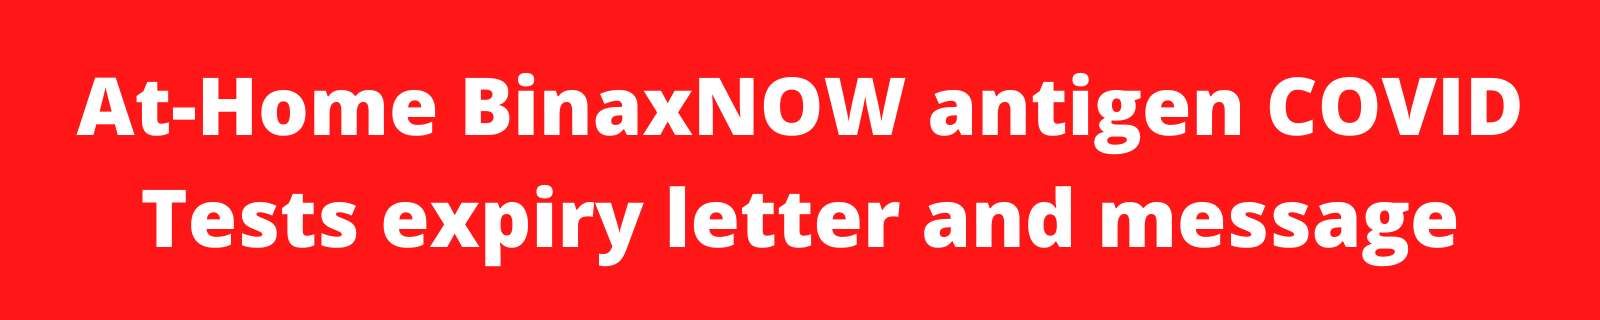 BinaxNOW Information